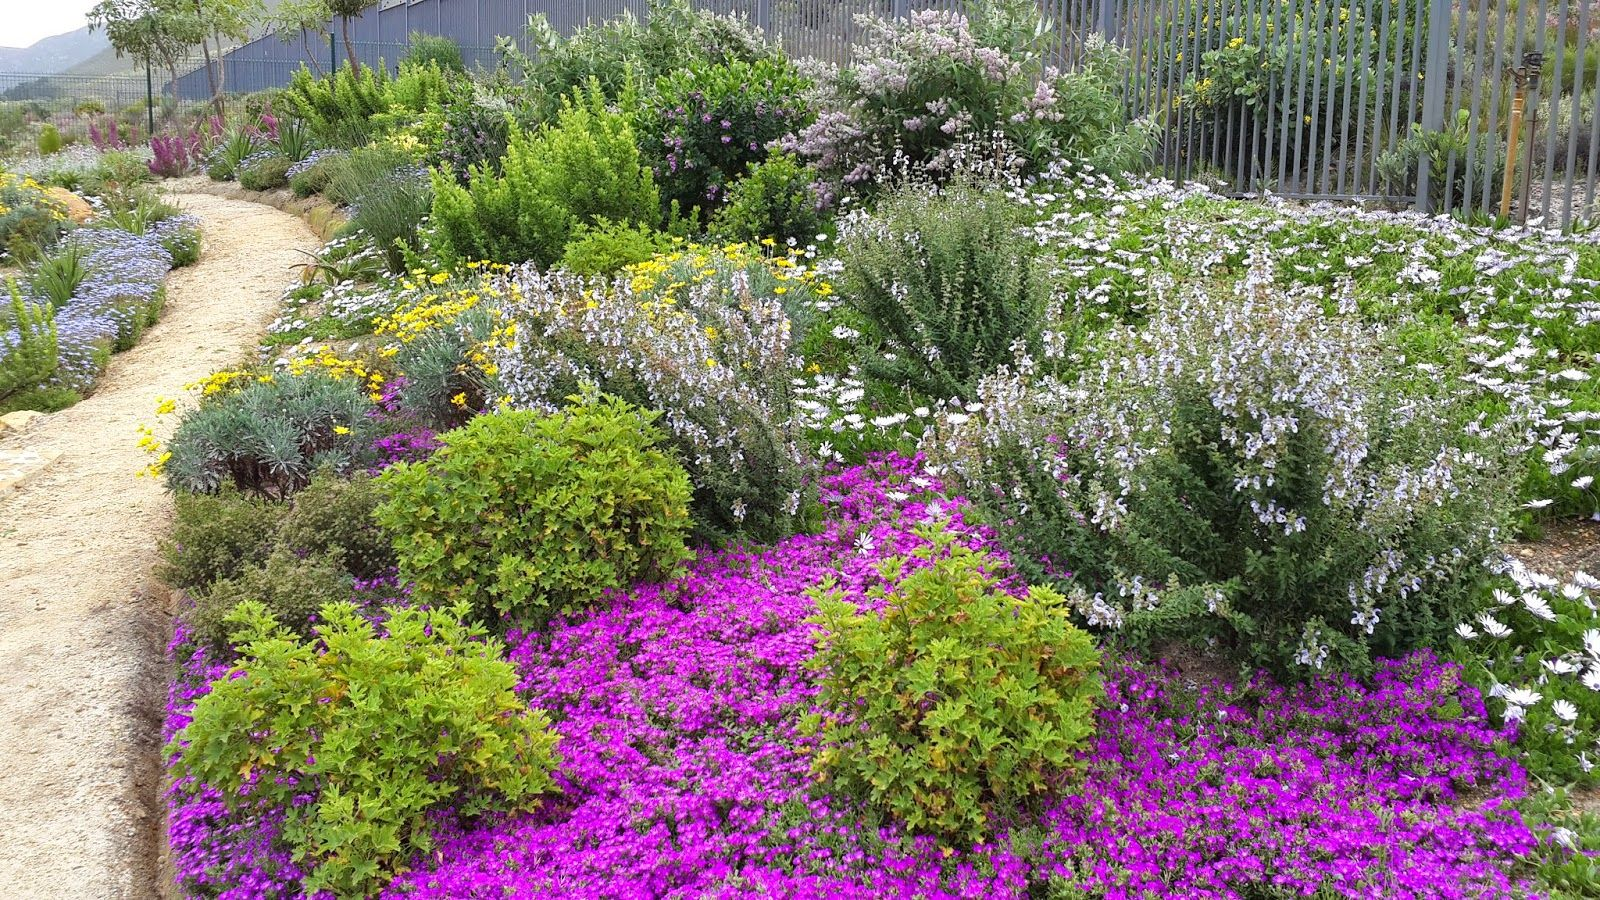 Fynbos Gardens Hermanus Spring 2014 Small garden